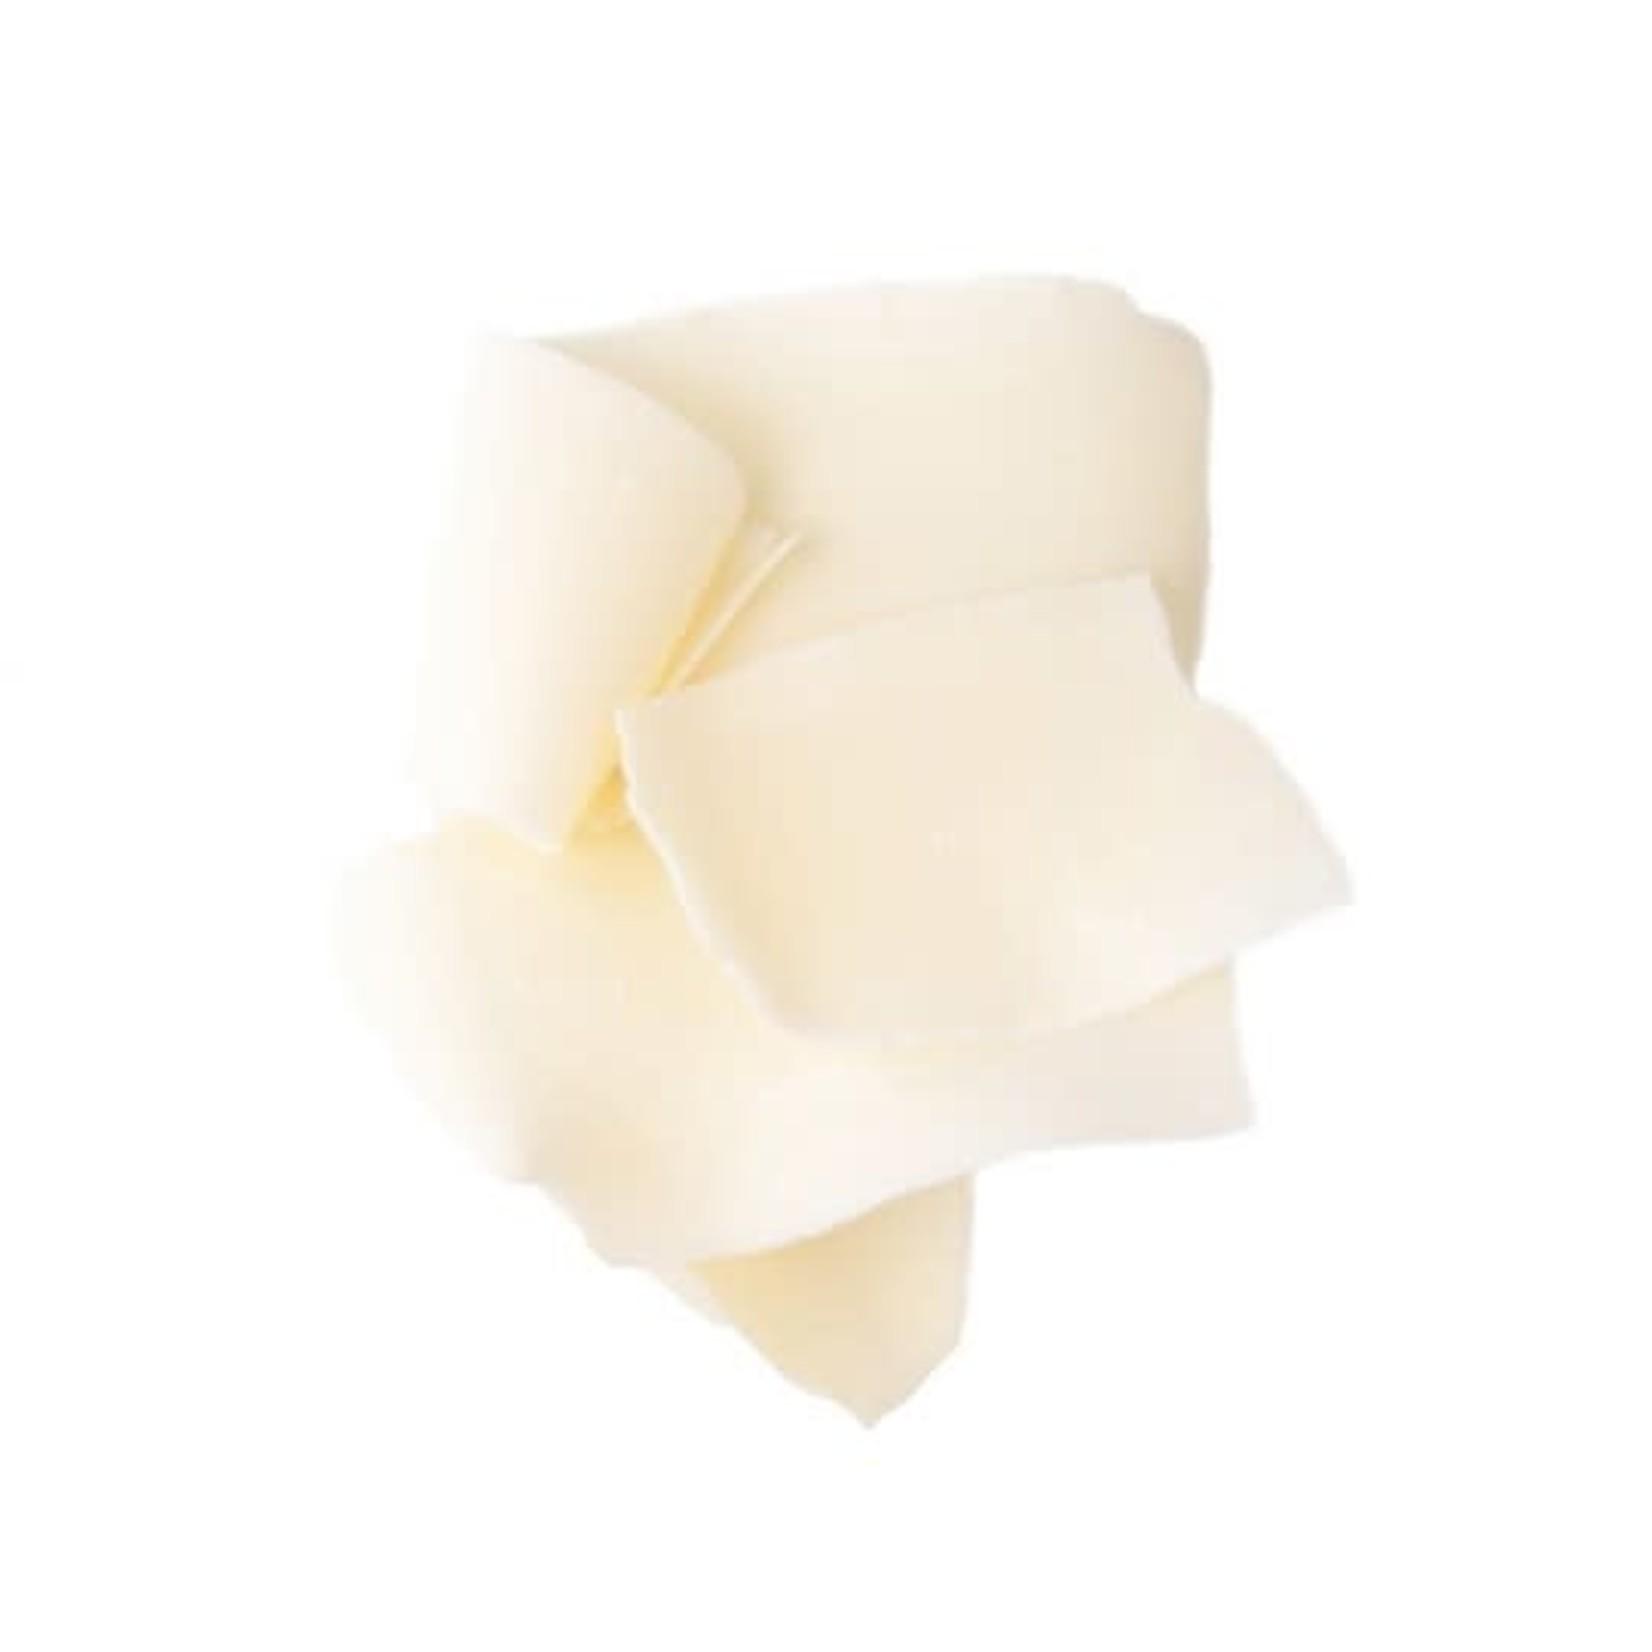 Dobla Dobla - White Chocolate Ribbon shavings - 5.5 lbs, 43142/96314